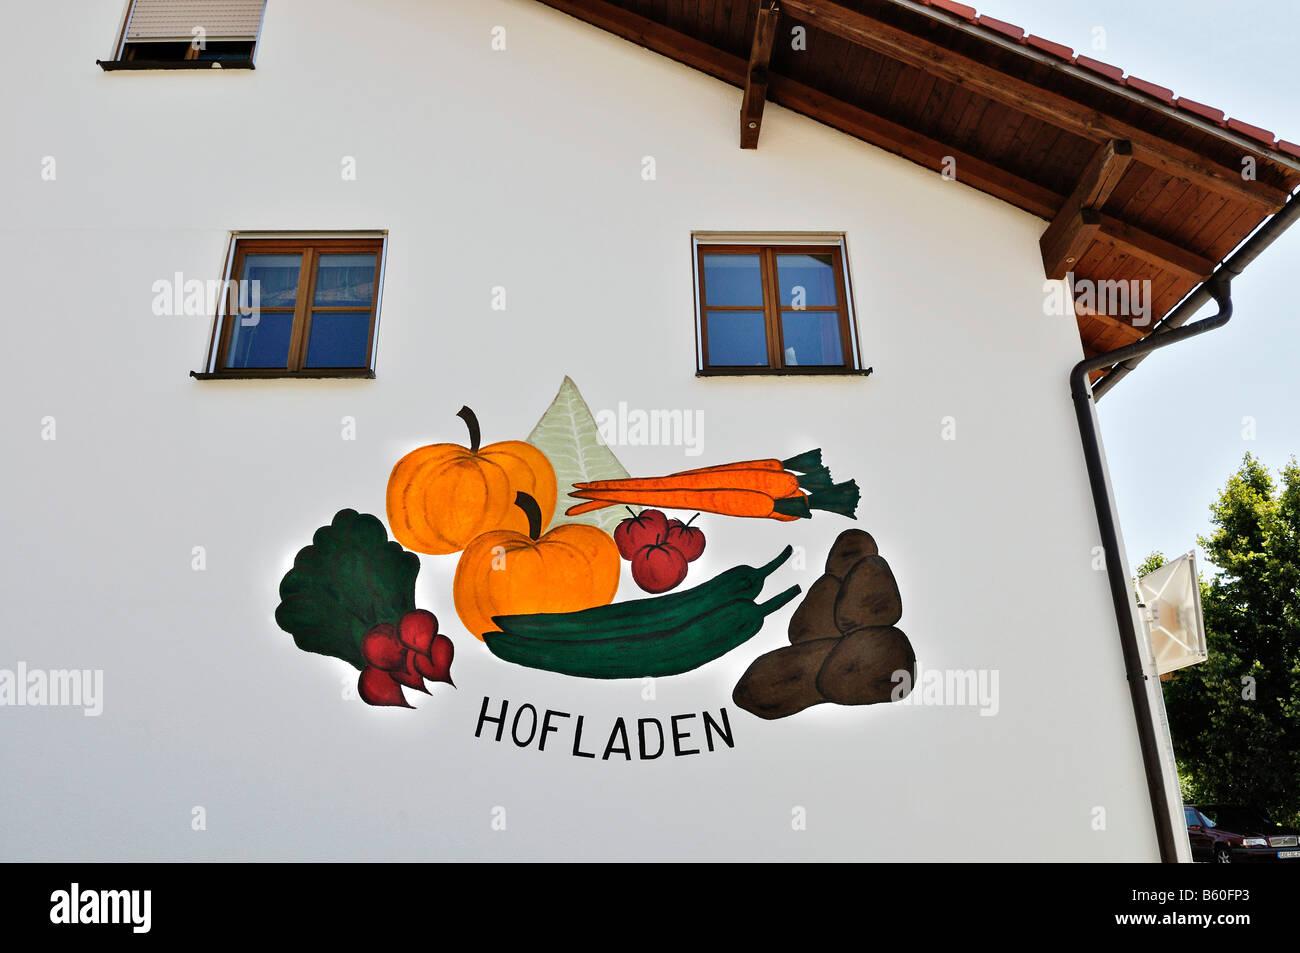 Hofladen or farm shop near Munich, Bavaria - Stock Image